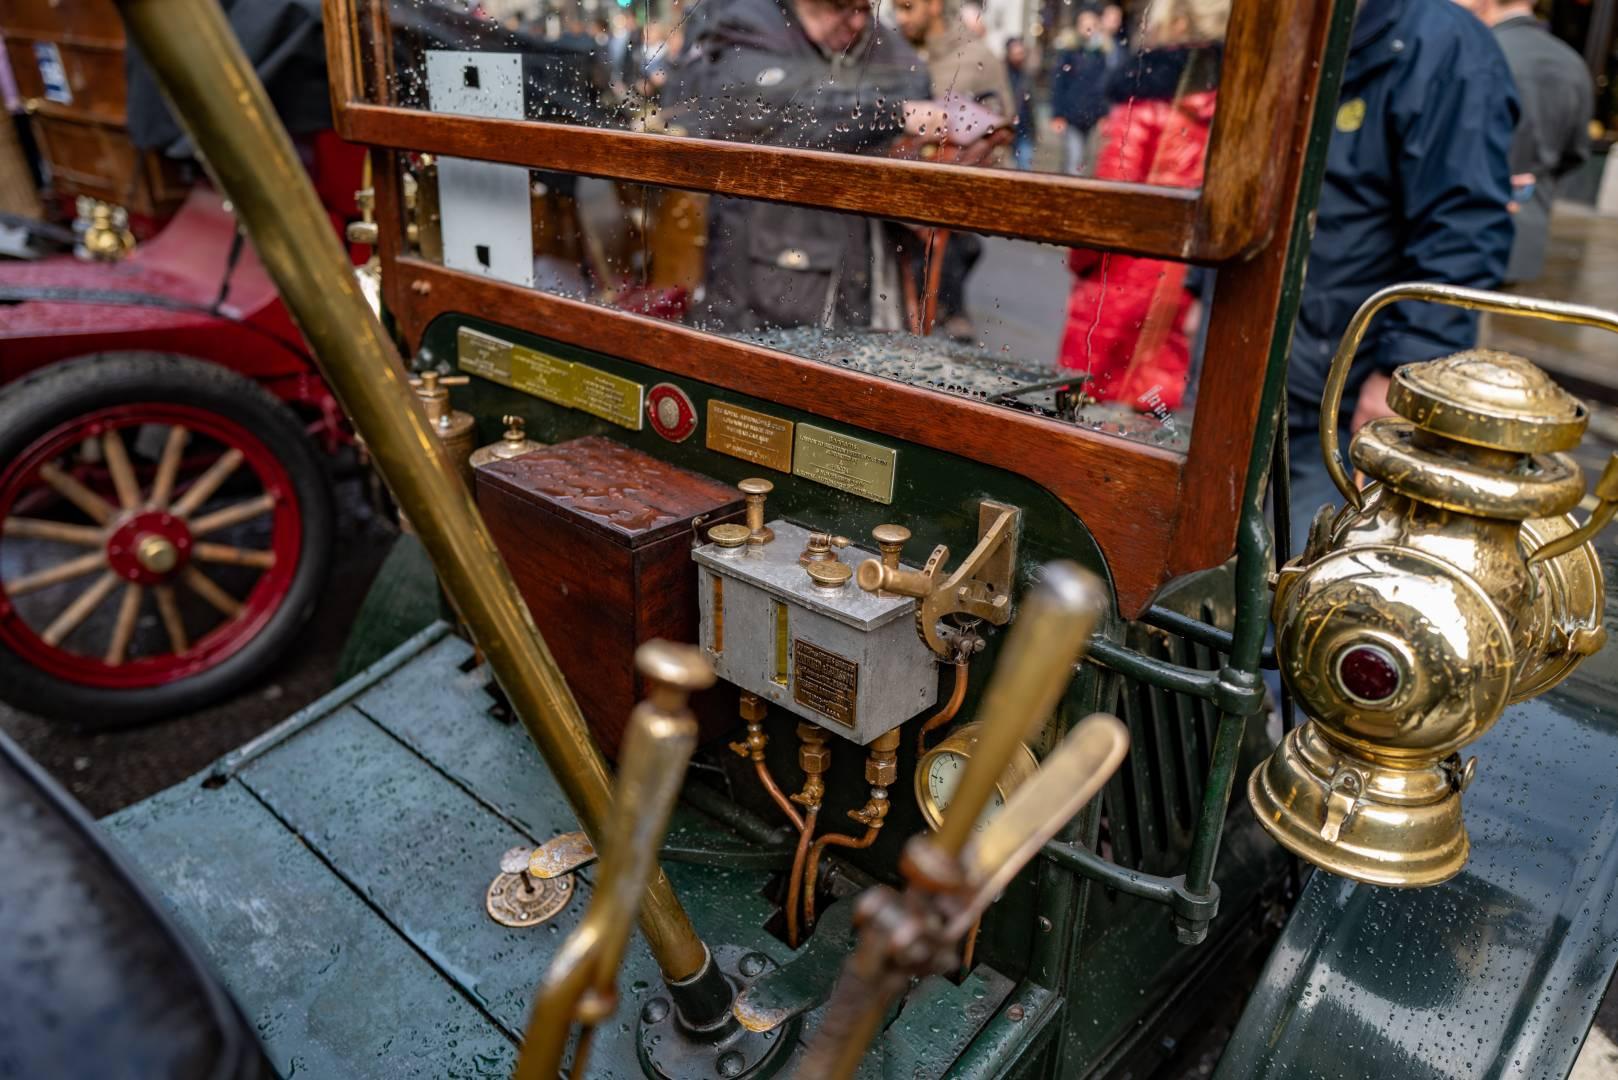 Brass steering column, faraway knobs